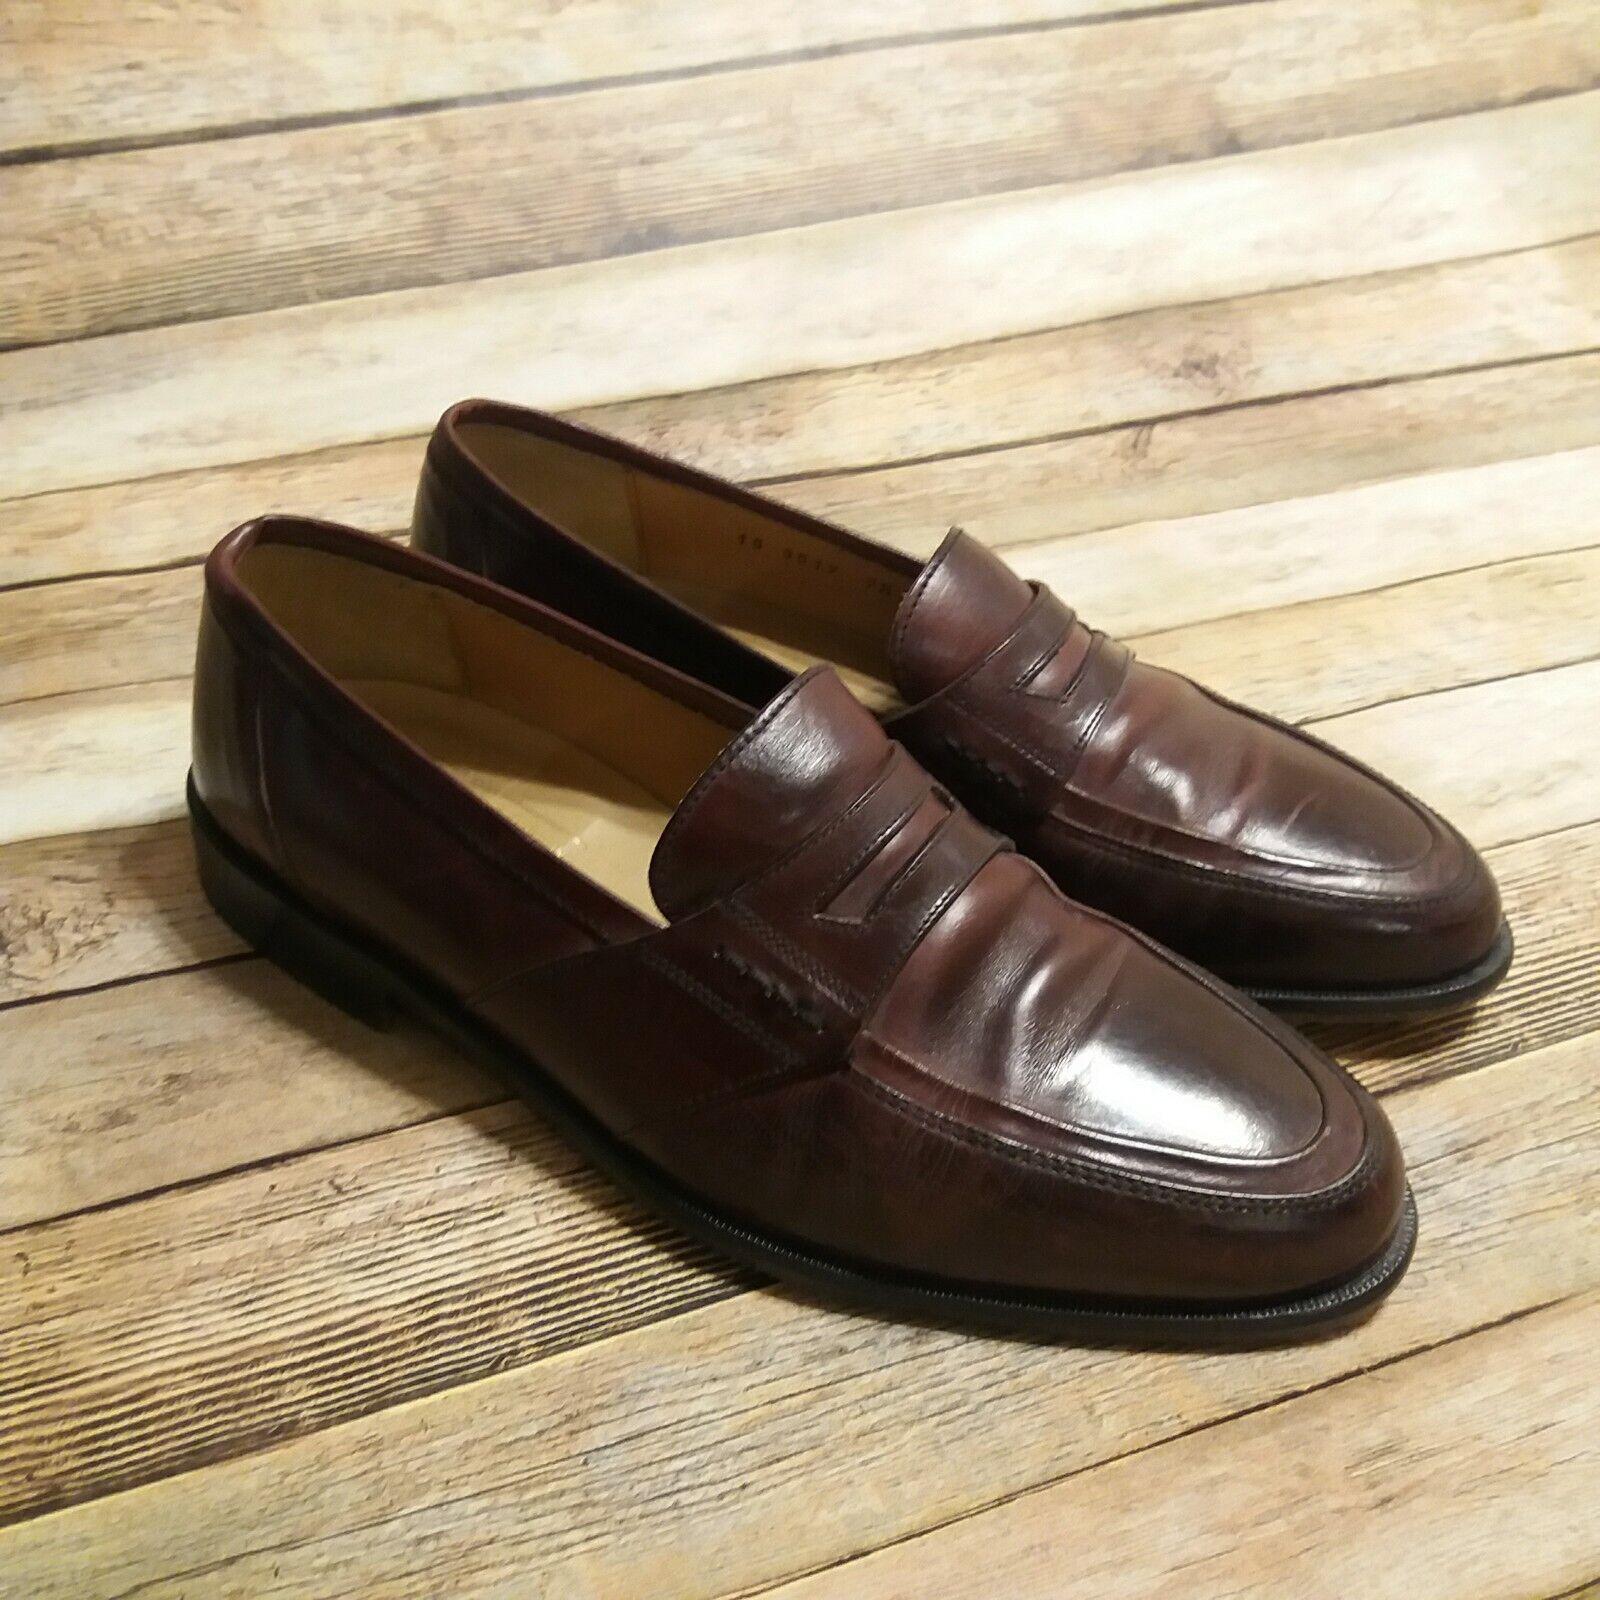 Johnston Murphy Cellini Men Loafer Slip on Leather Size 7.5 M Maroon Color